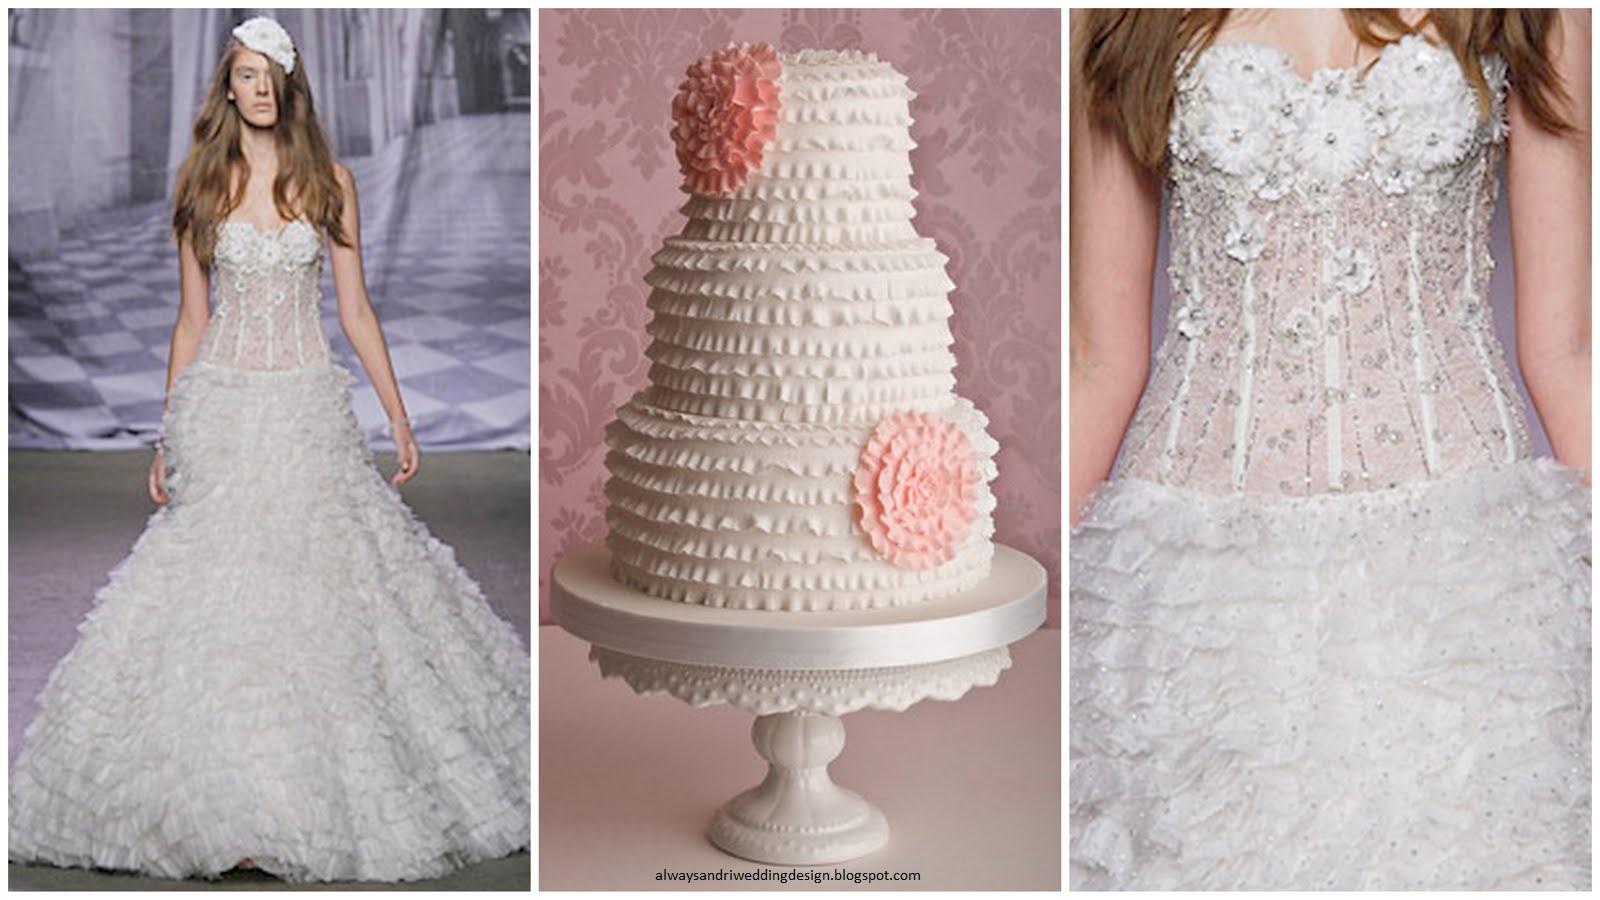 bolo12 1 - Bolo de casamento inspirado no vestido da noiva